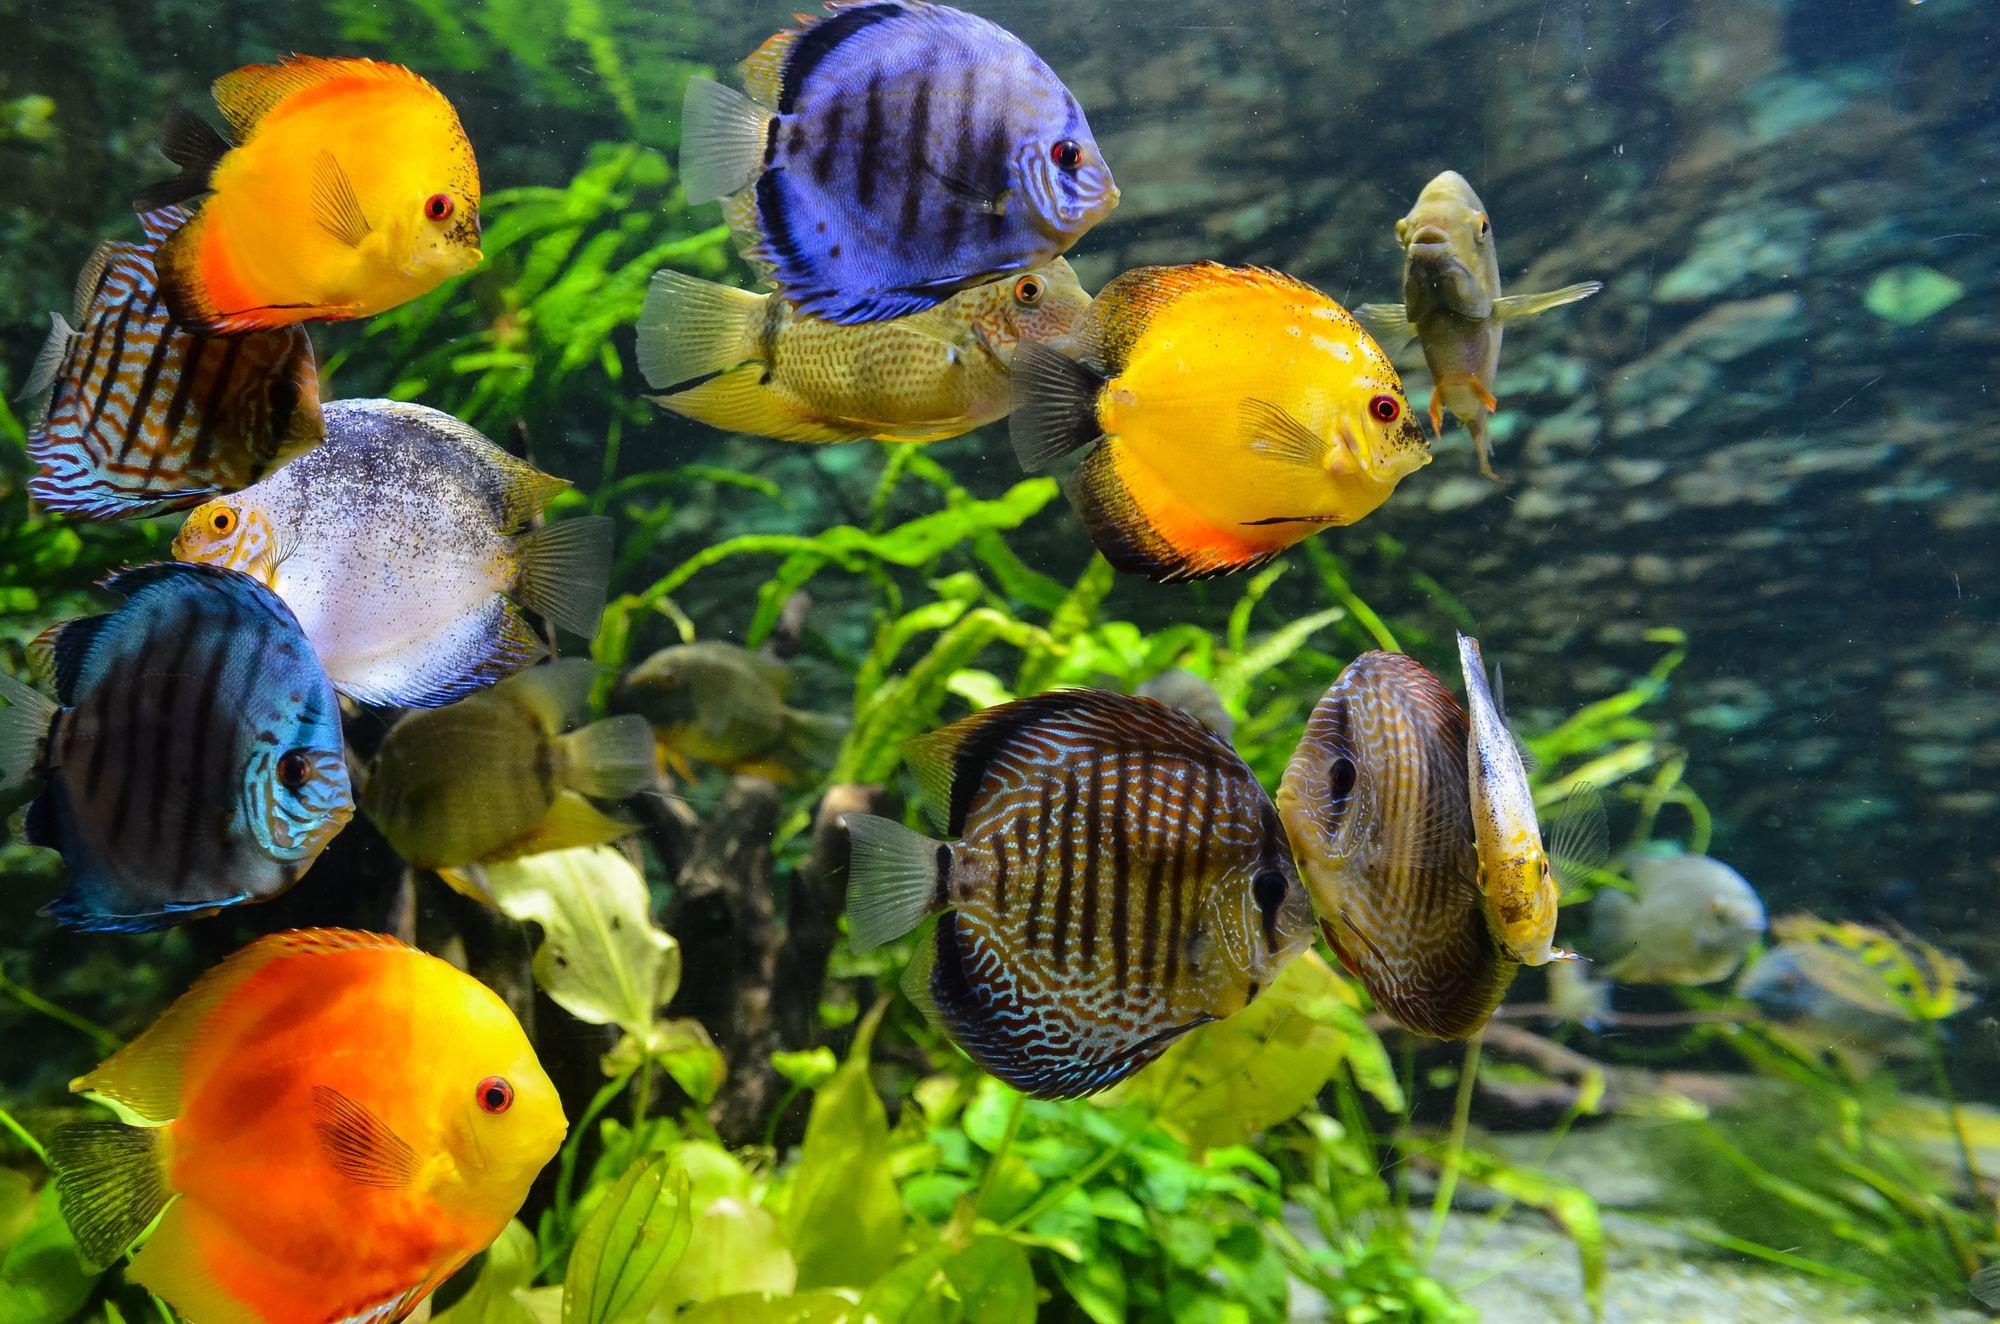 The best tropical aquarium fish for beginners aquatics world for Best starter fish